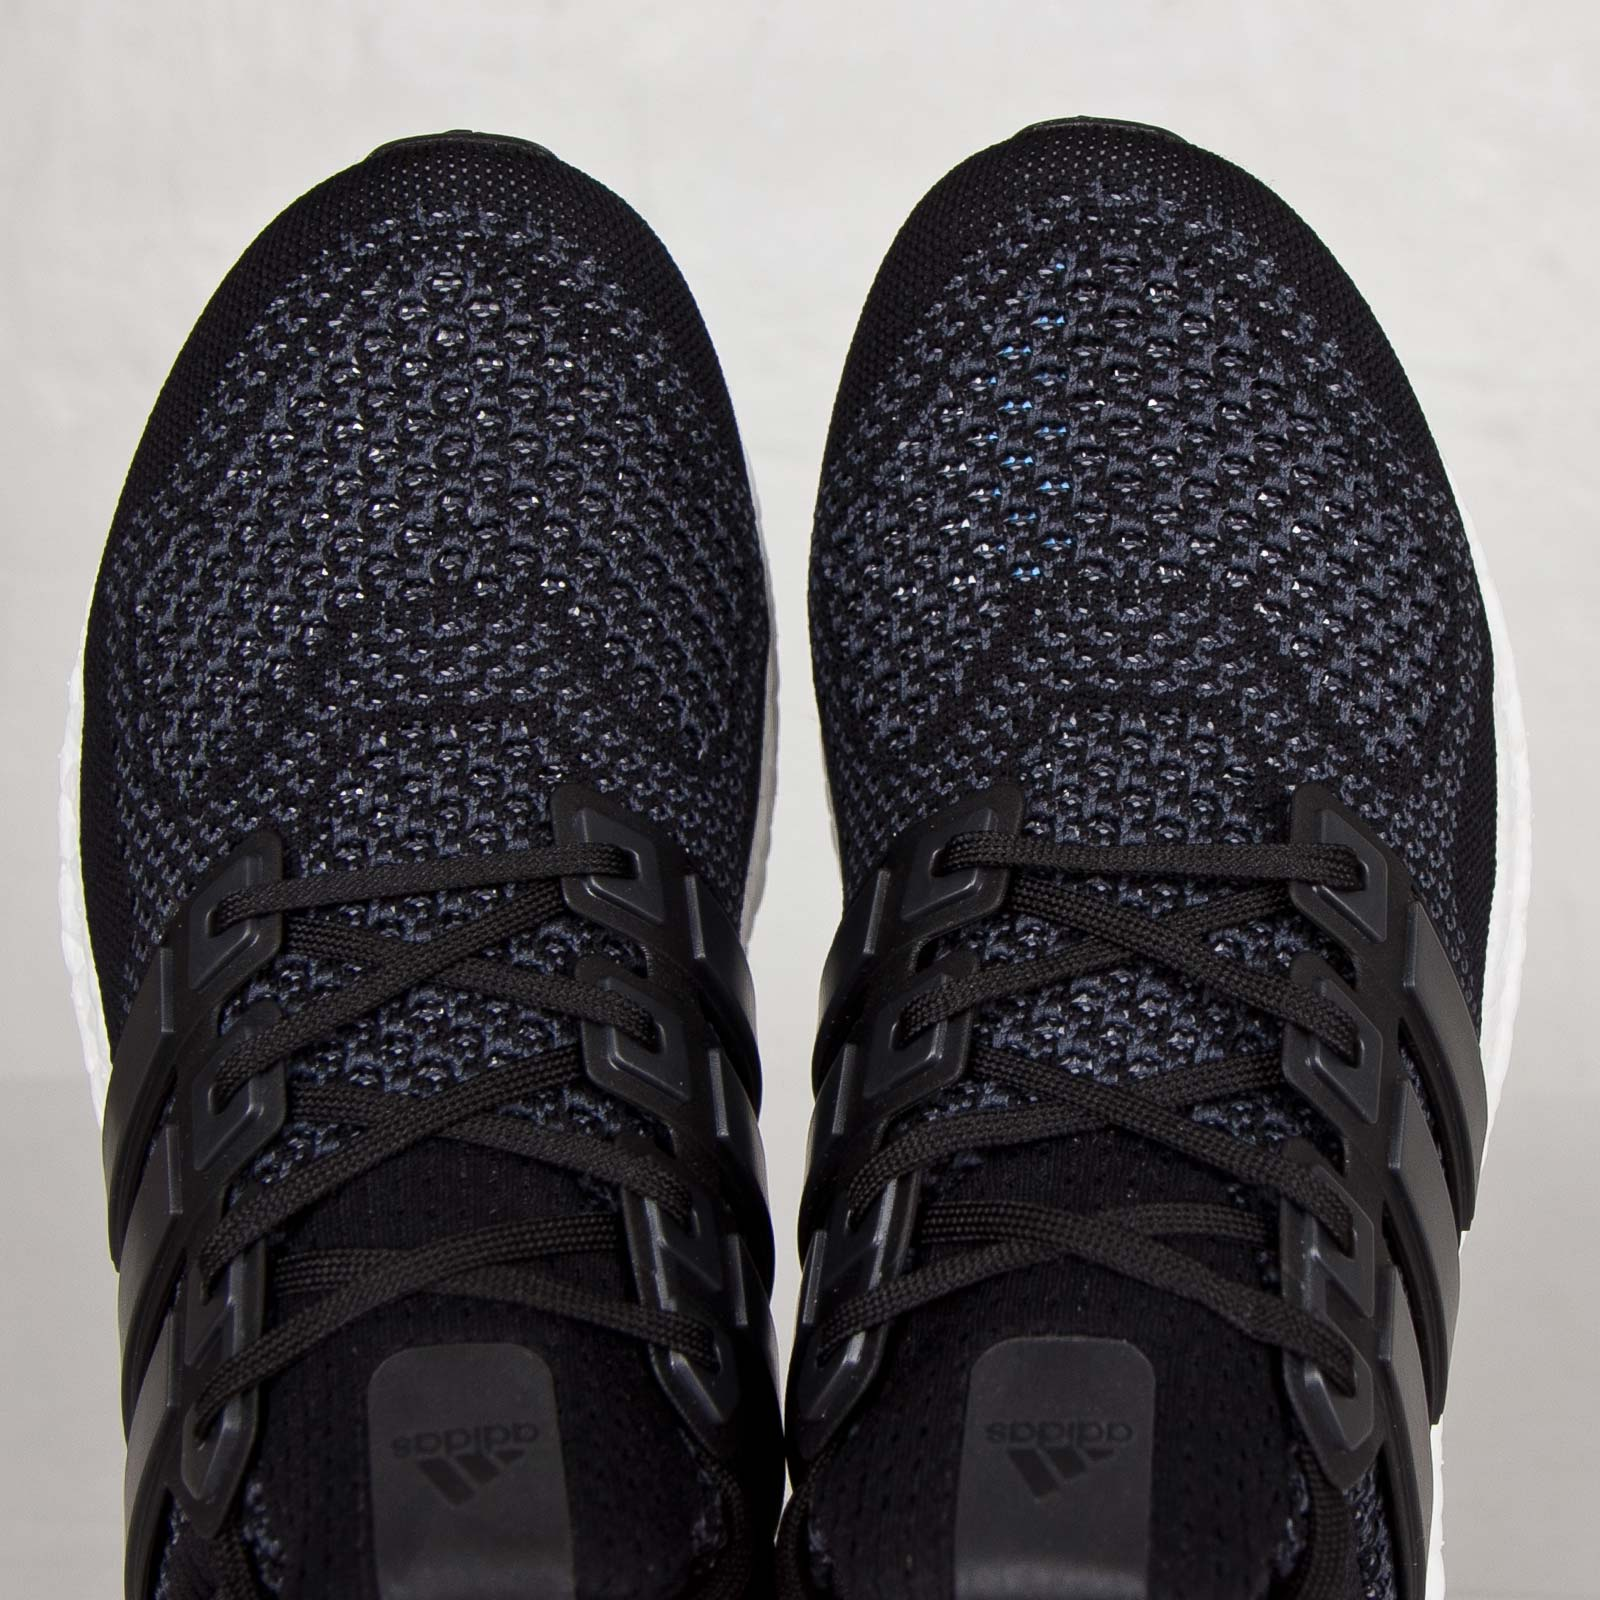 280fdeeda adidas ultra boost m - B27171 - Sneakersnstuff